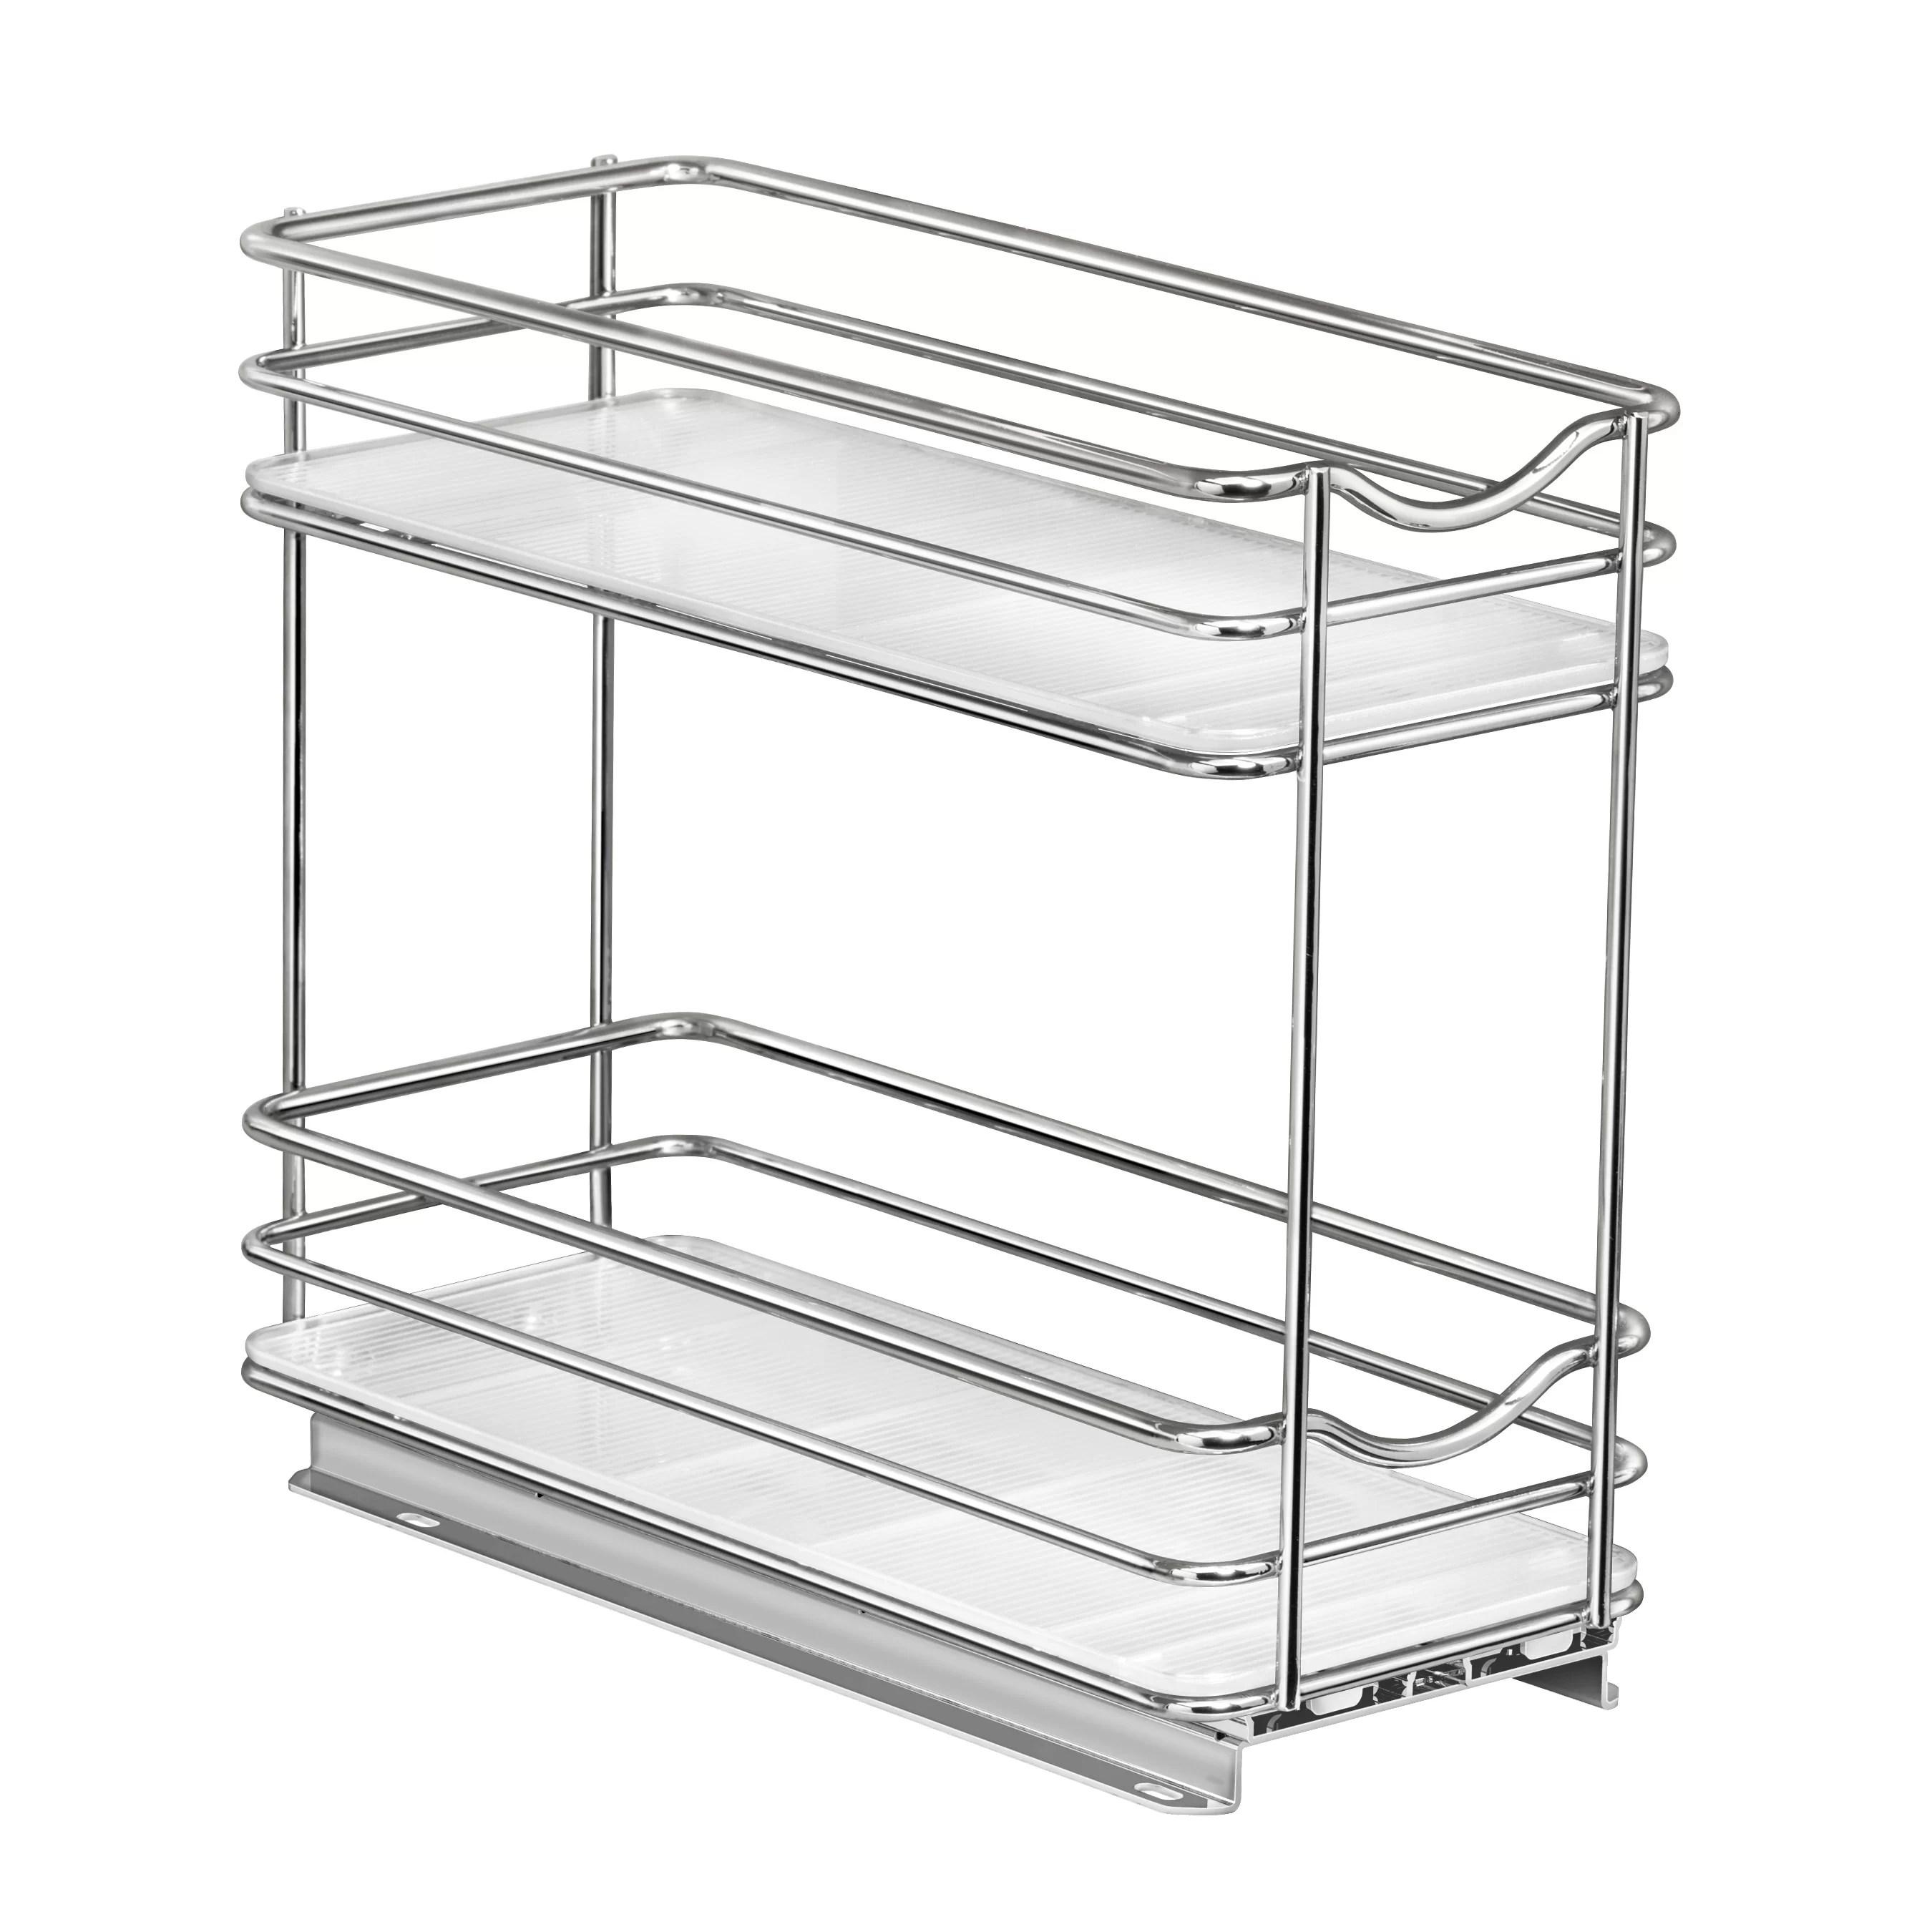 slide out double upper cabinet organizer 20 jar spice rack